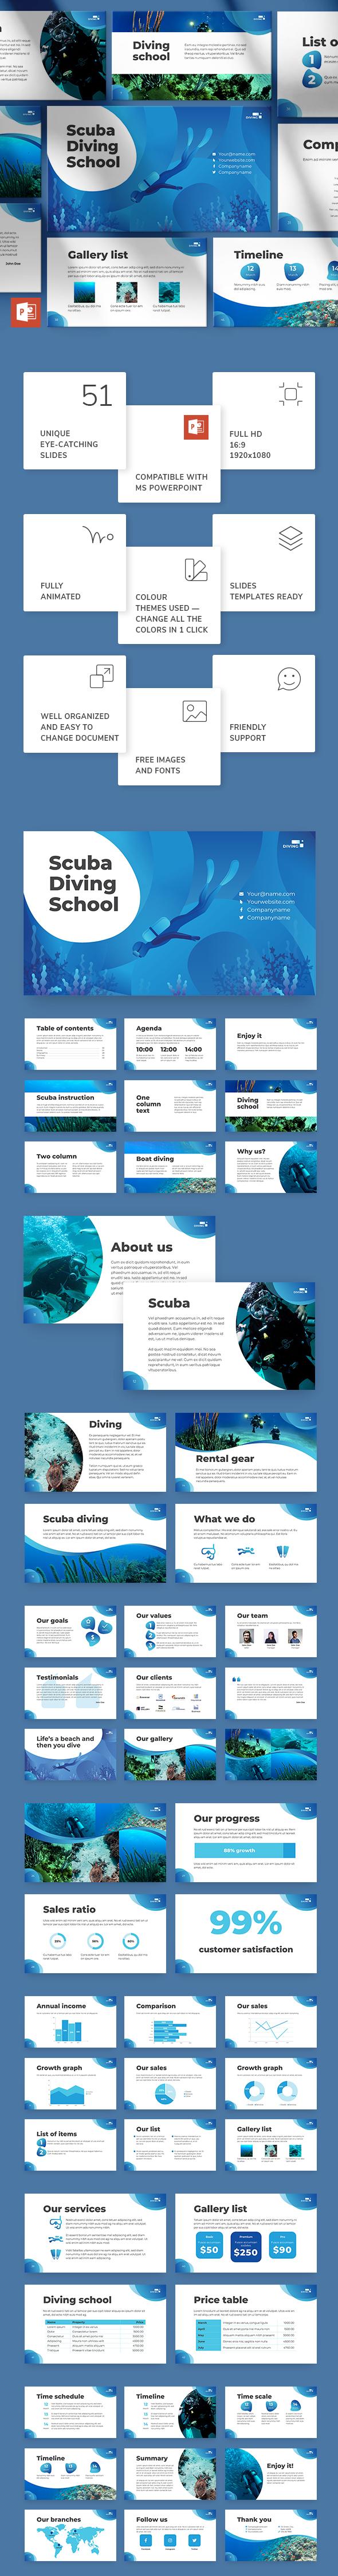 Diving School PowerPoint Presentation Template